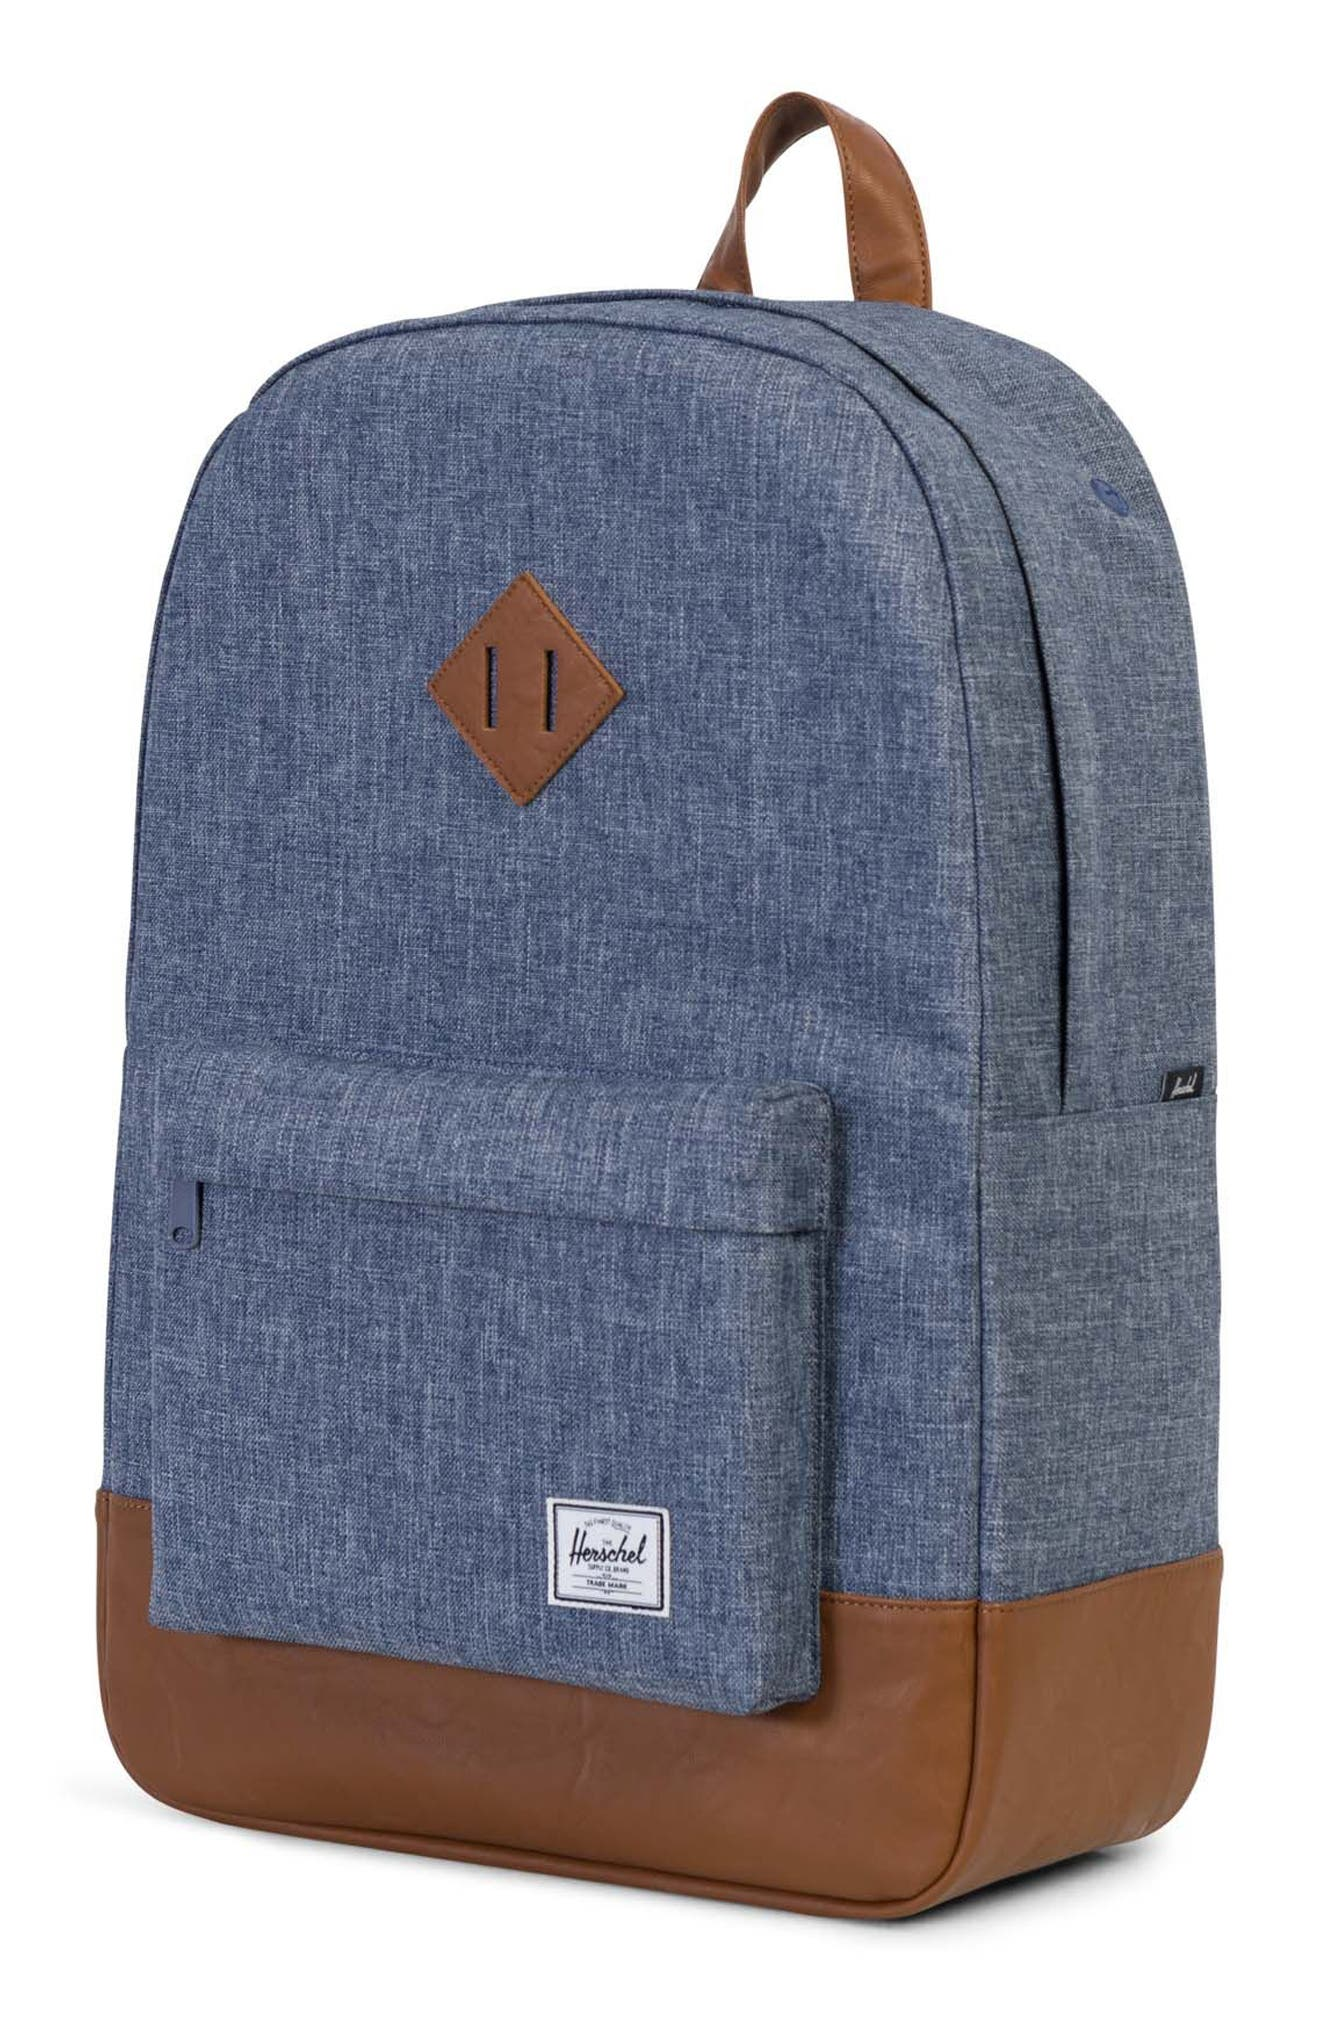 Heritage Backpack,                             Alternate thumbnail 4, color,                             Dark Blue Crosshatch/ Tan